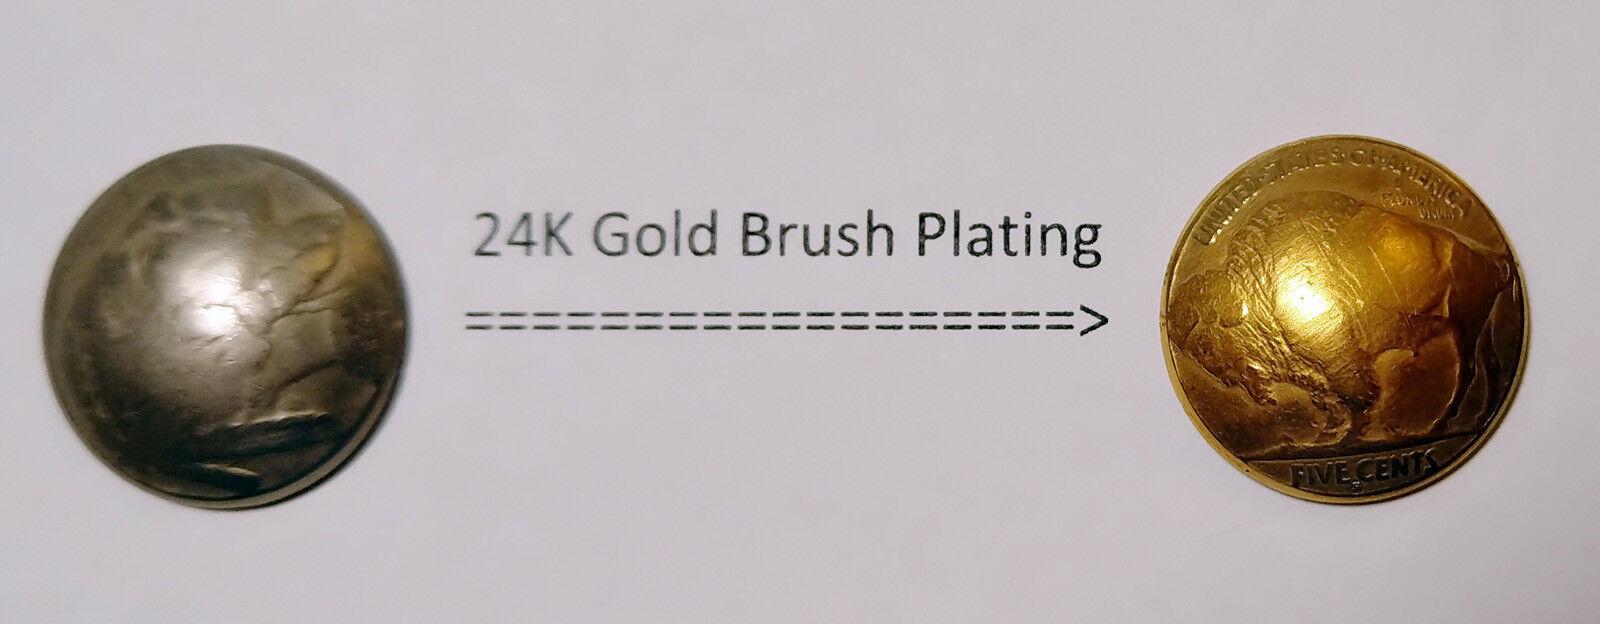 Лабораторный химикат DS-1: 24K Yellow Gold Plating Solution, Brush